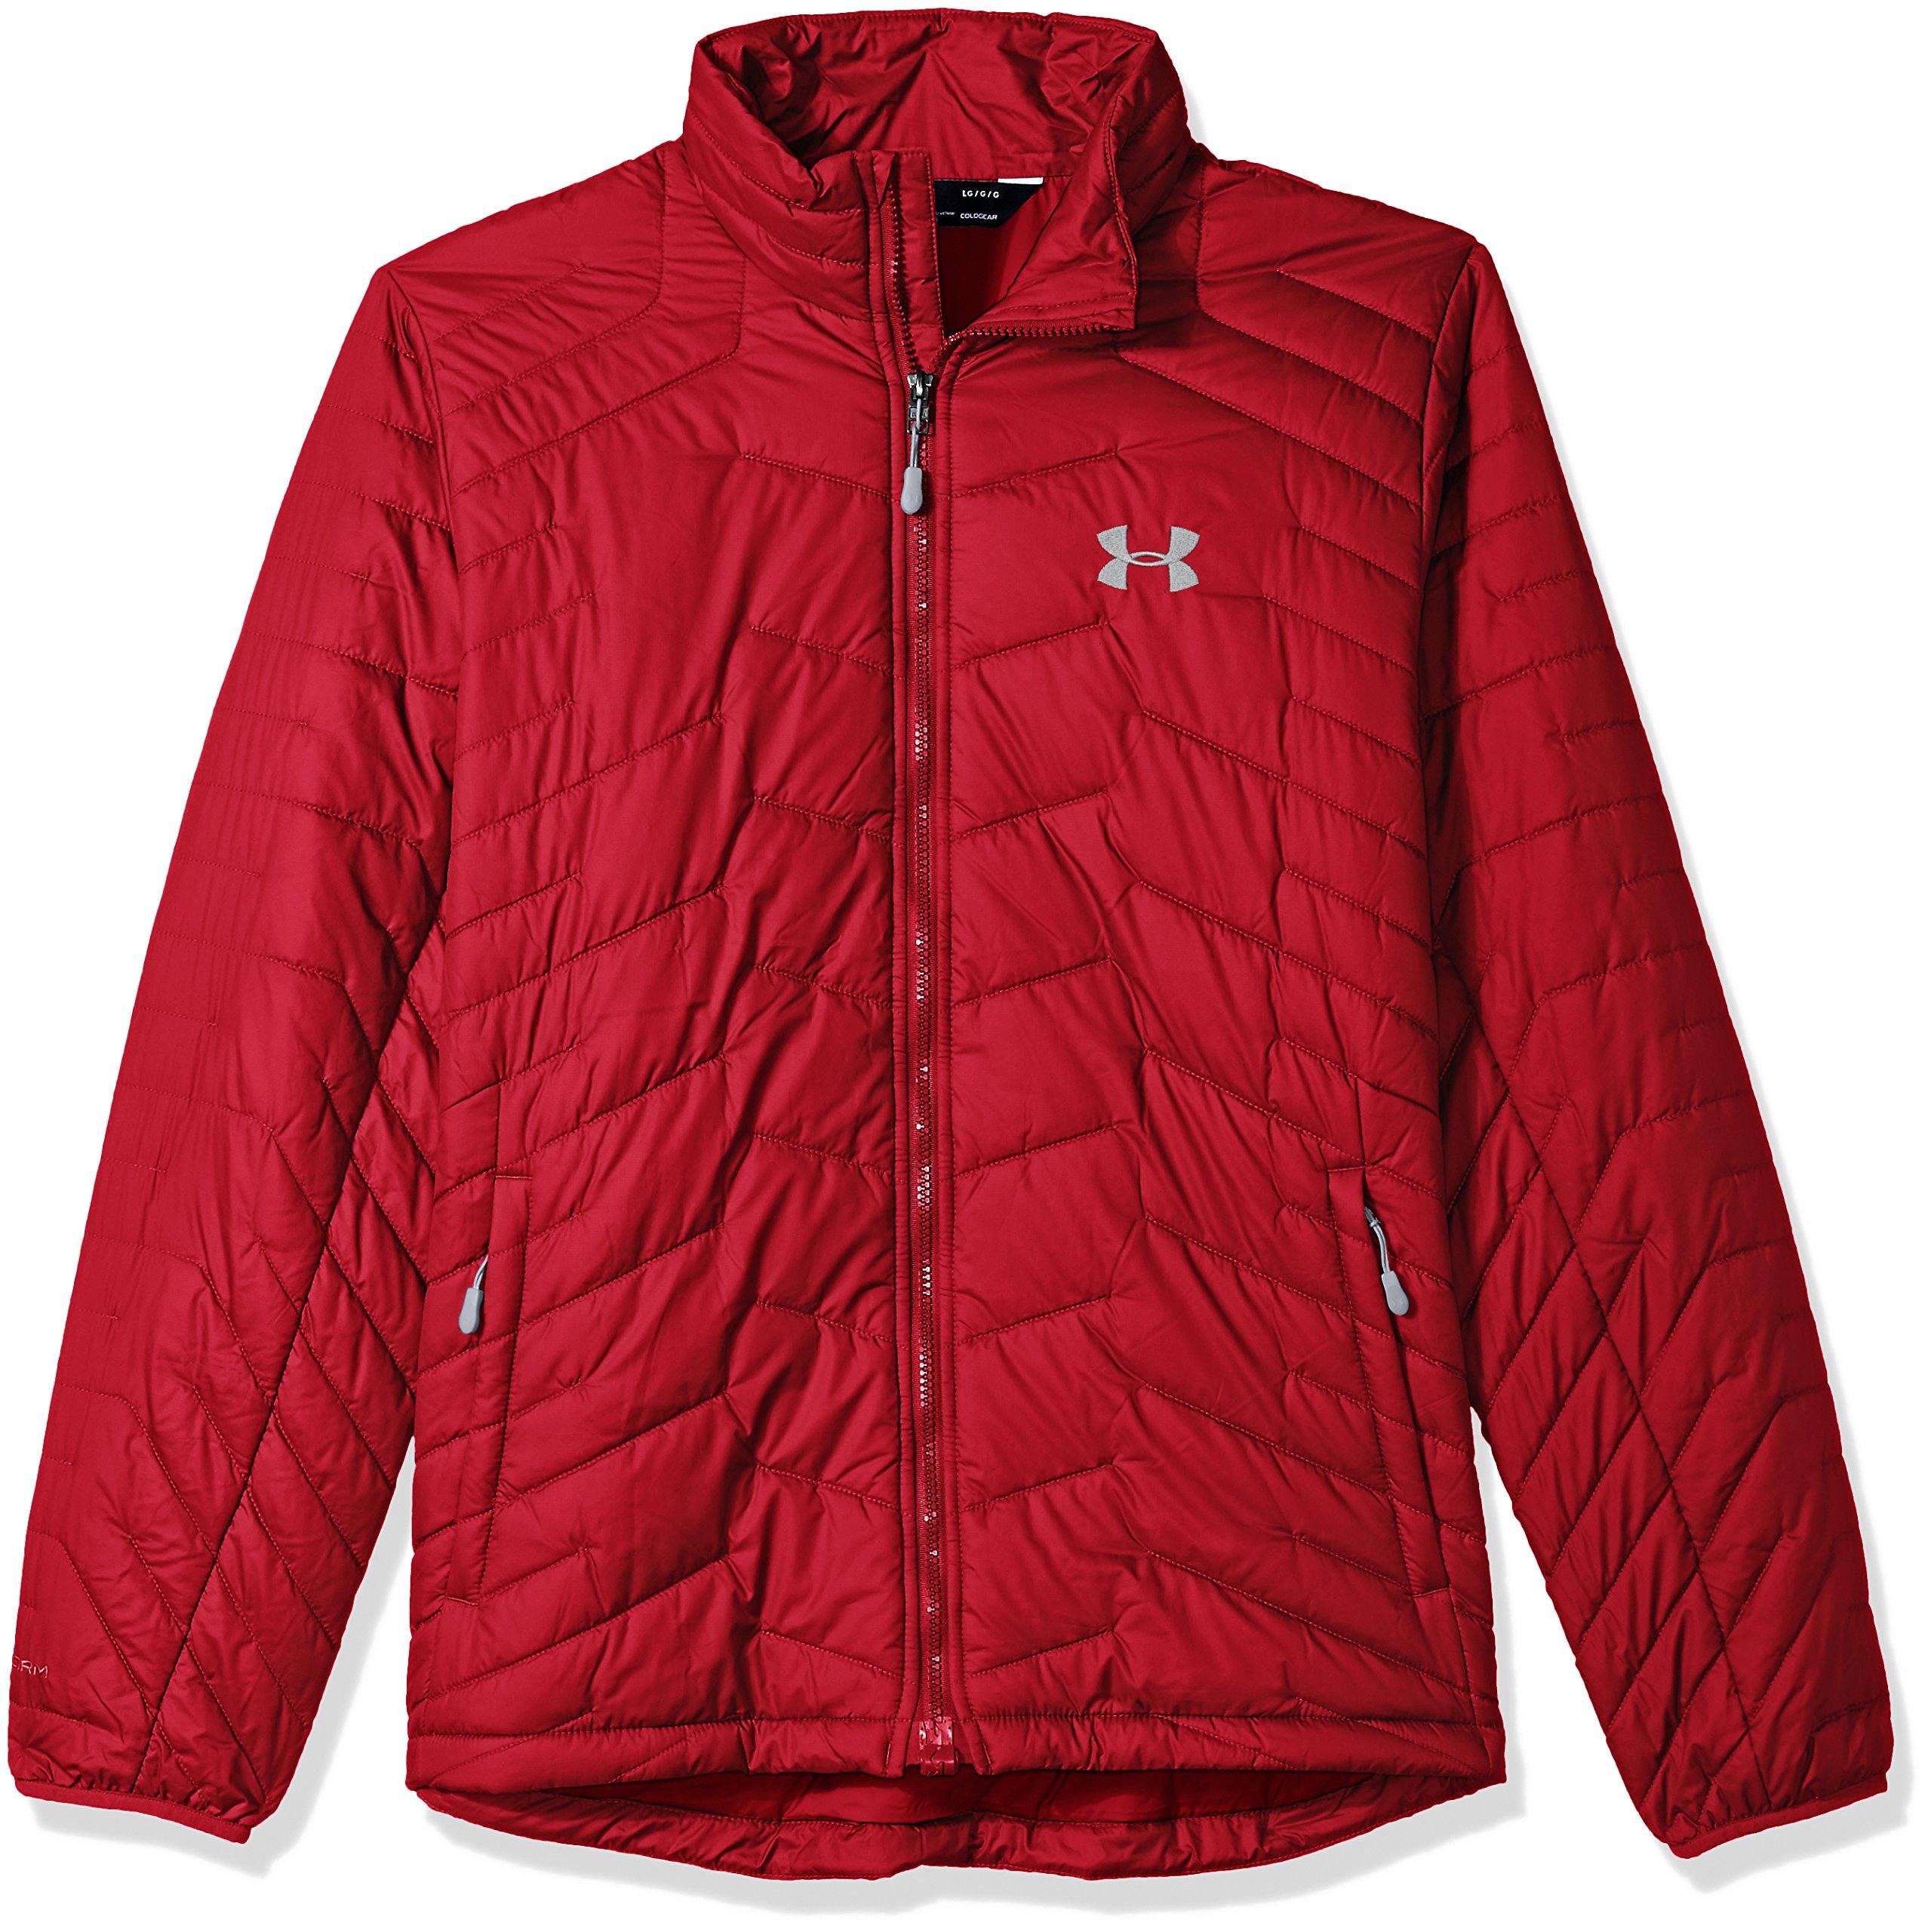 Under Armour Outerwear Men's Cold Gear Reactor Jacket, Crimson/Steel, 3X-Large